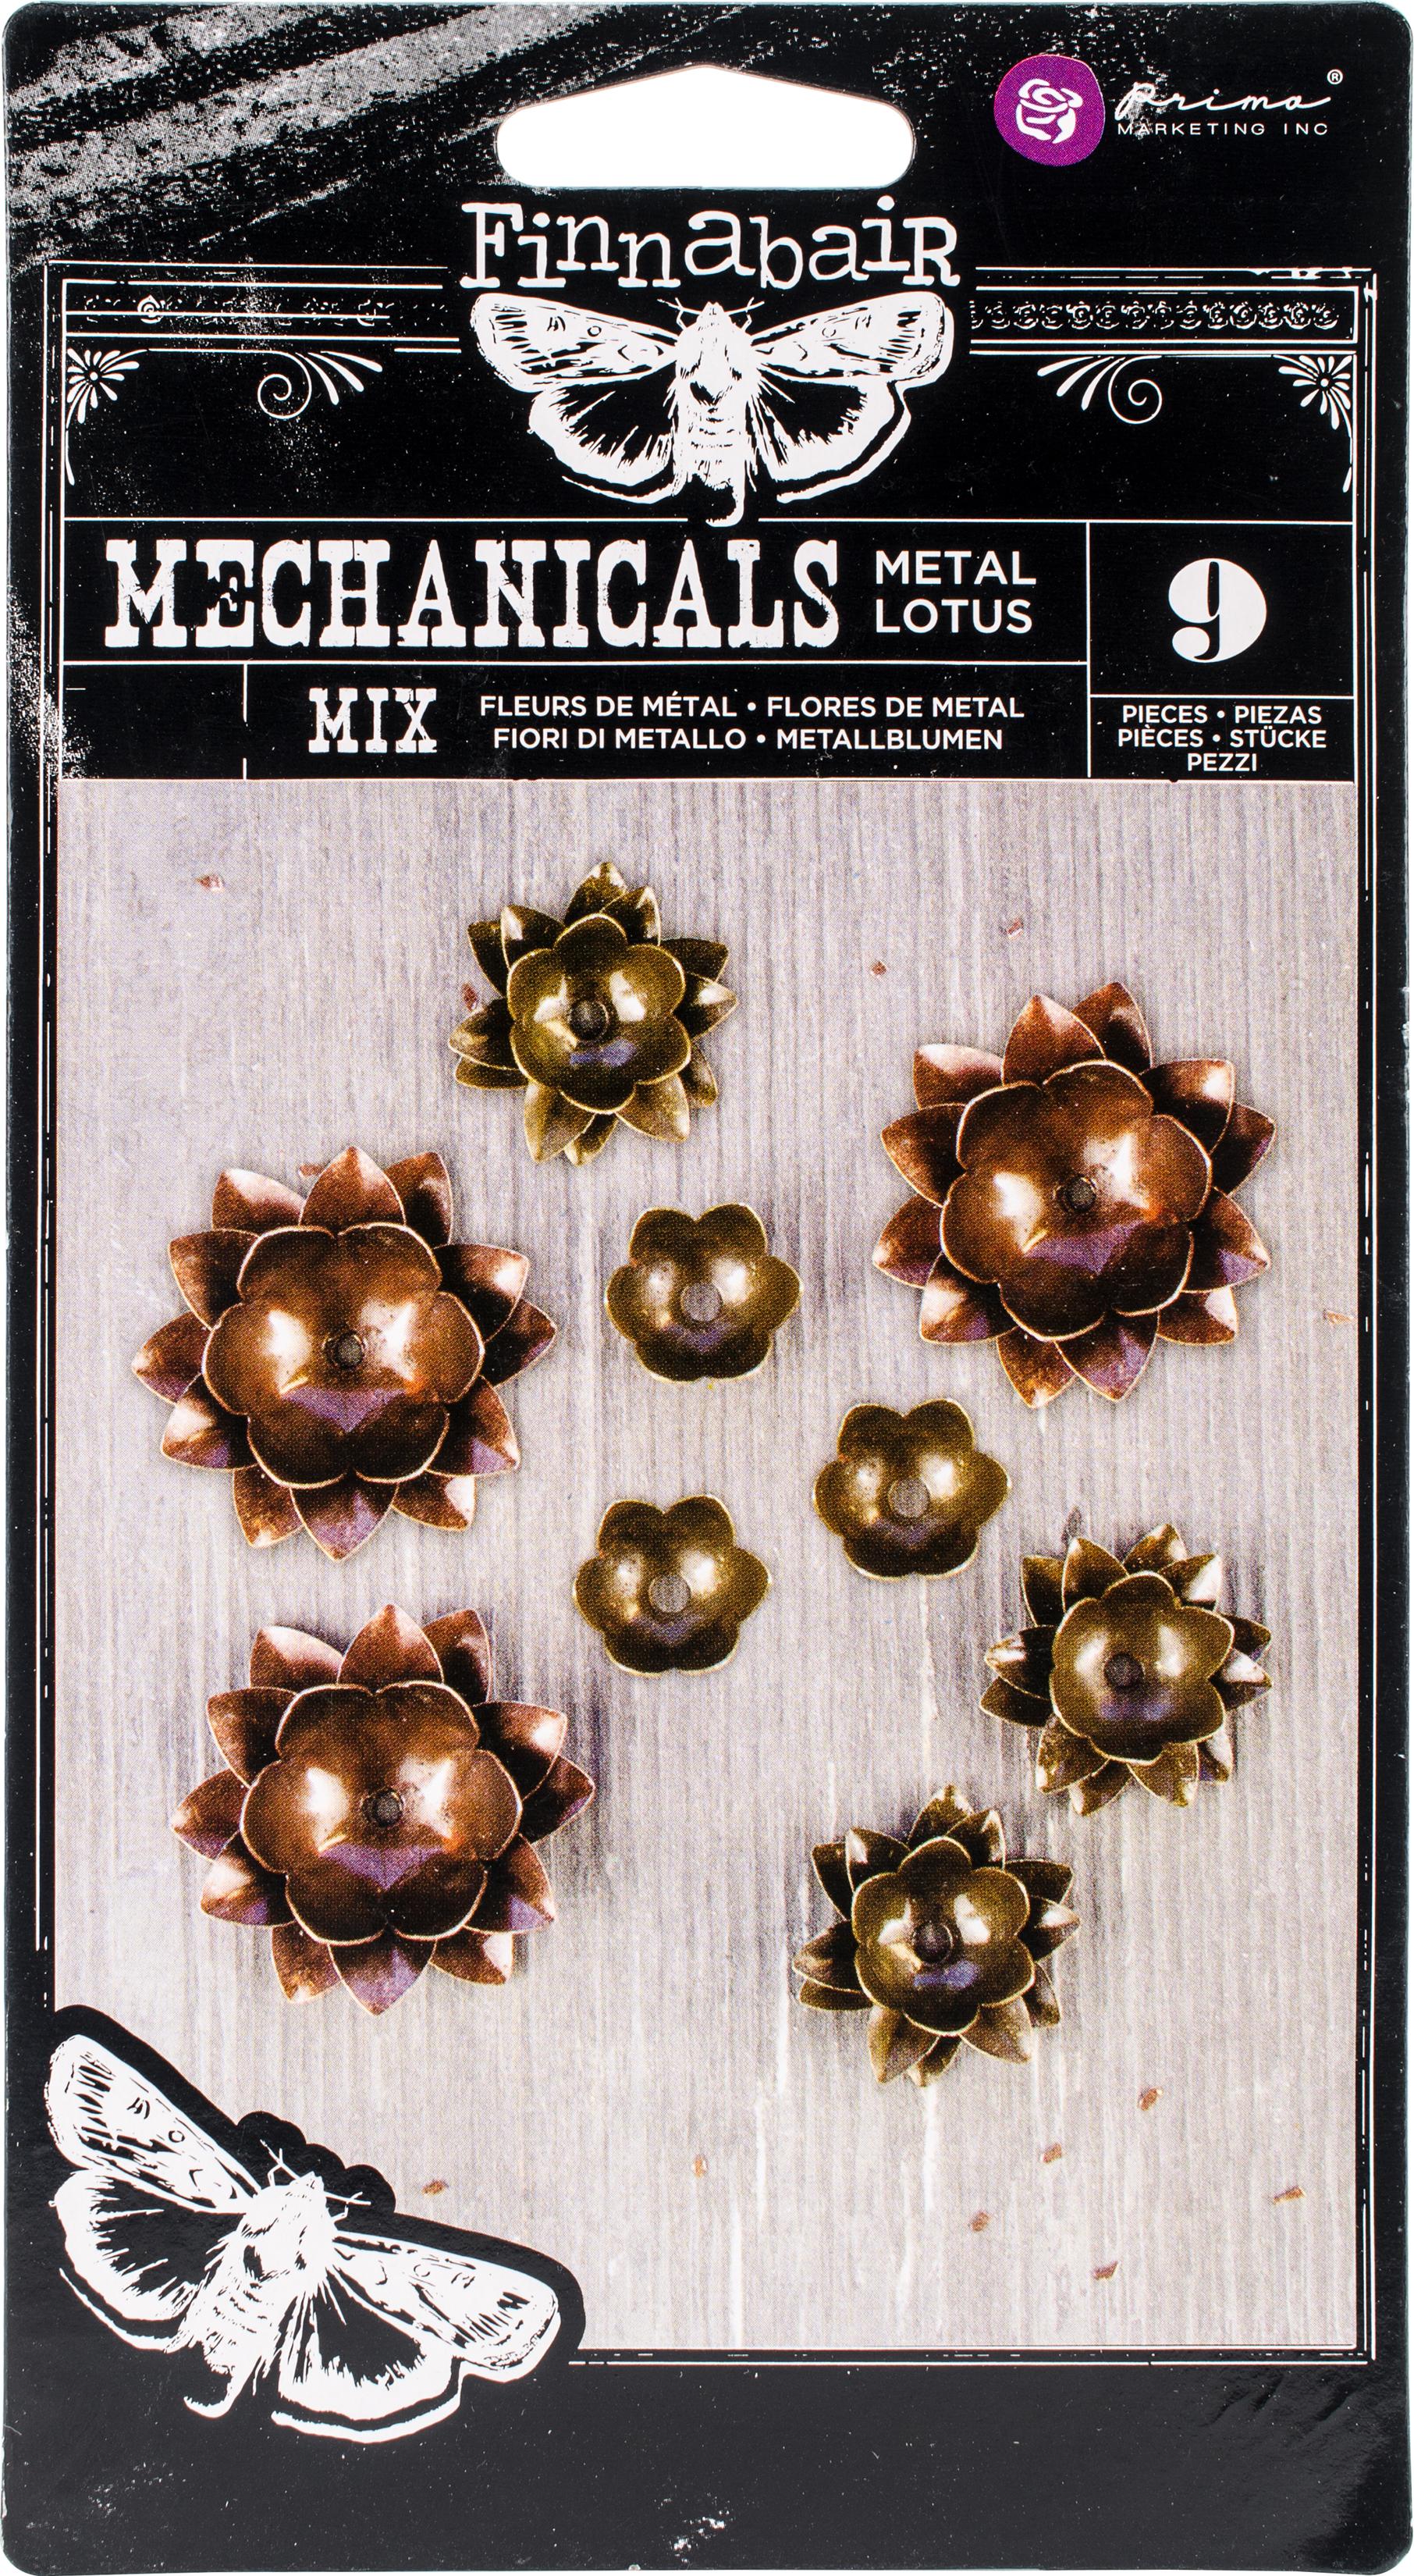 Mechanicals - Metal Lotus